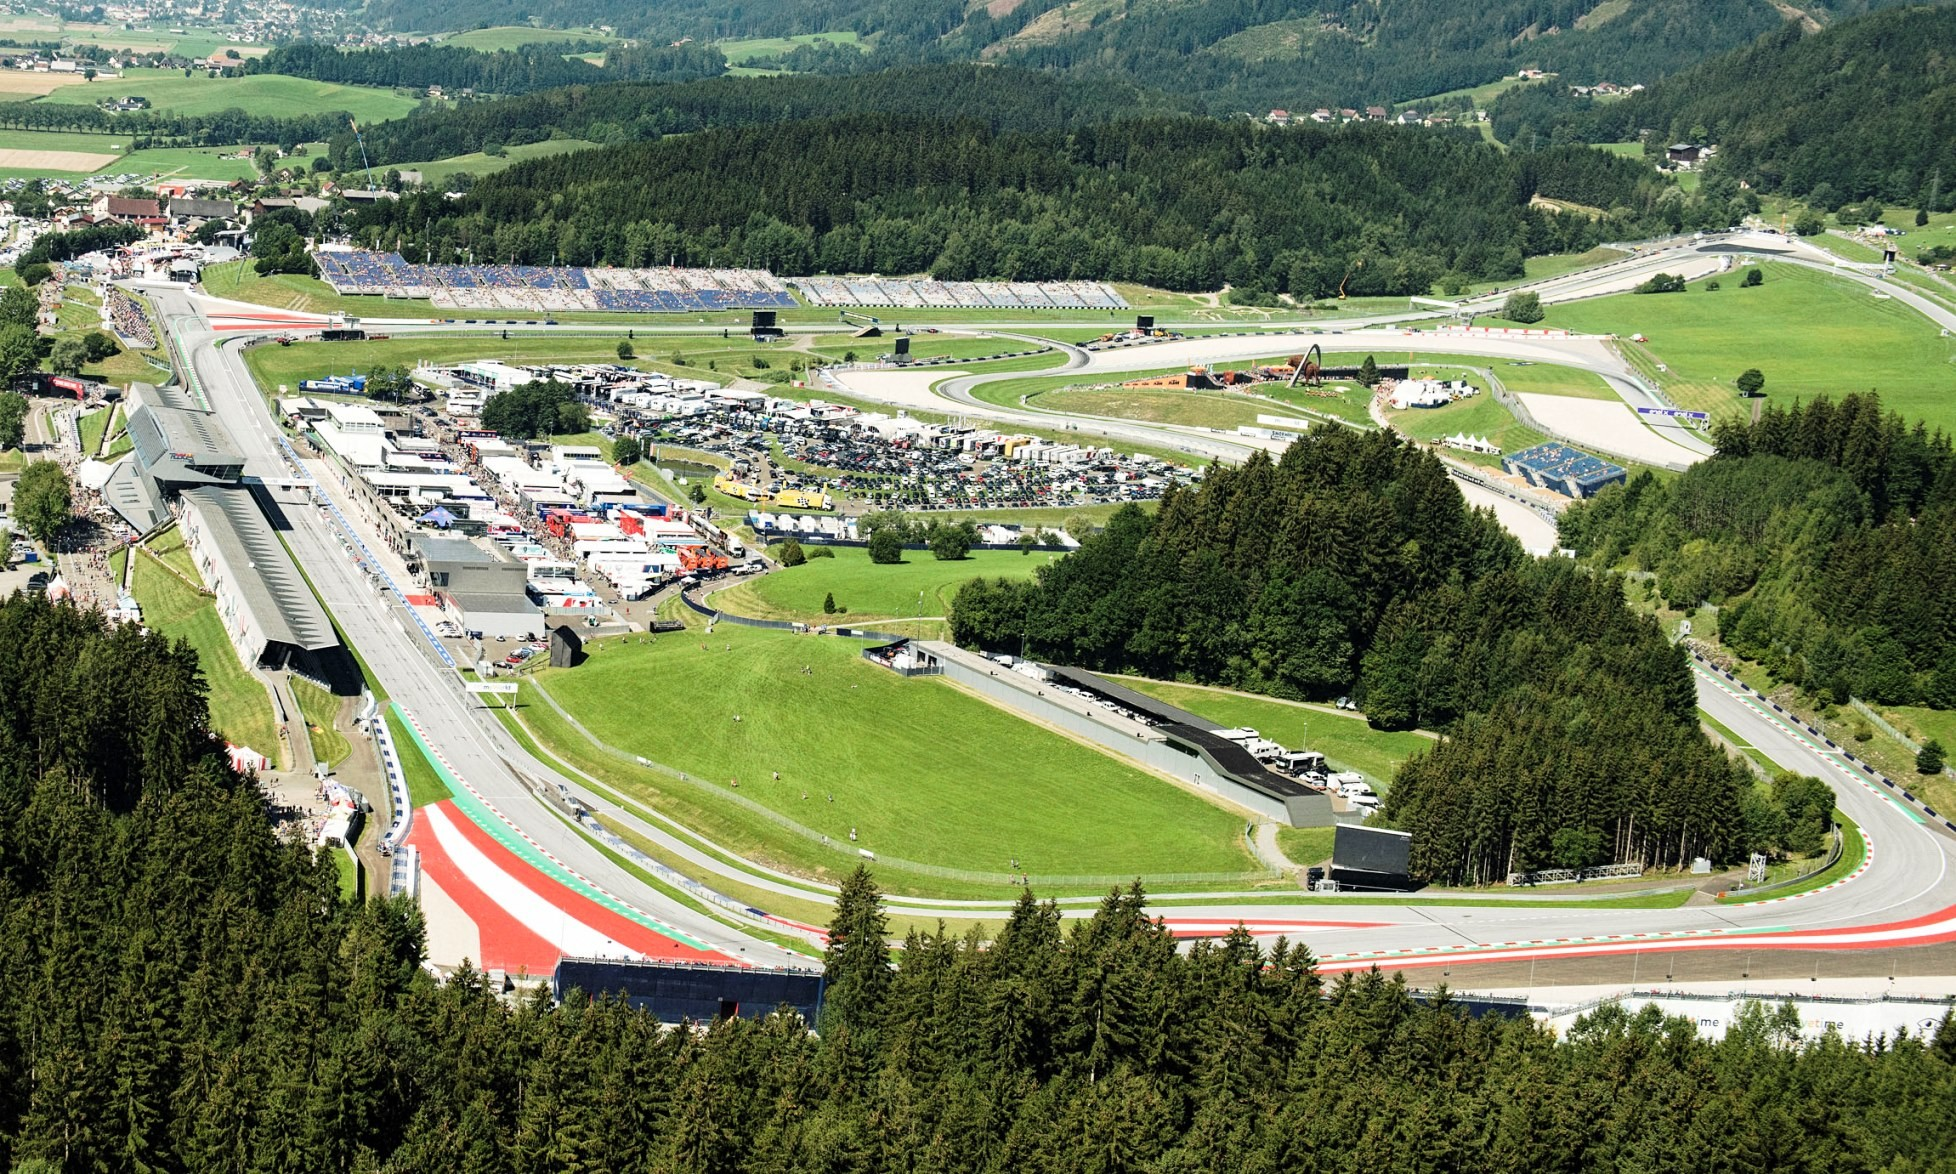 The Return of F1